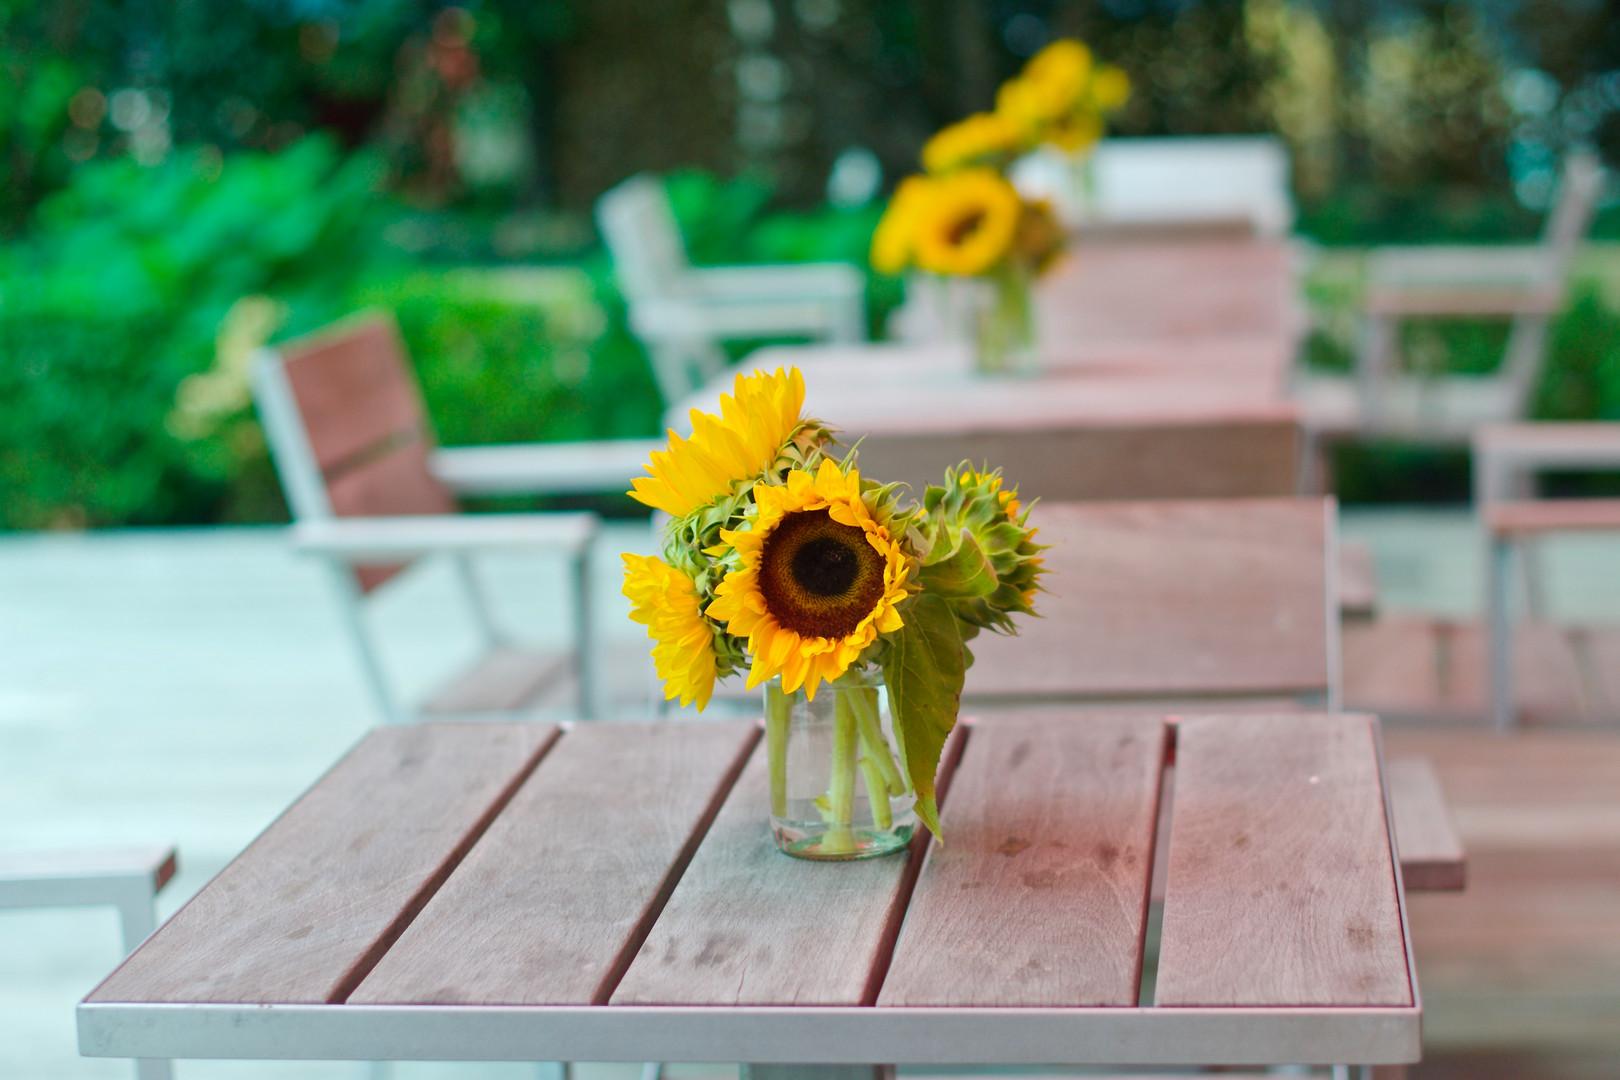 SunflowerDetail.jpg